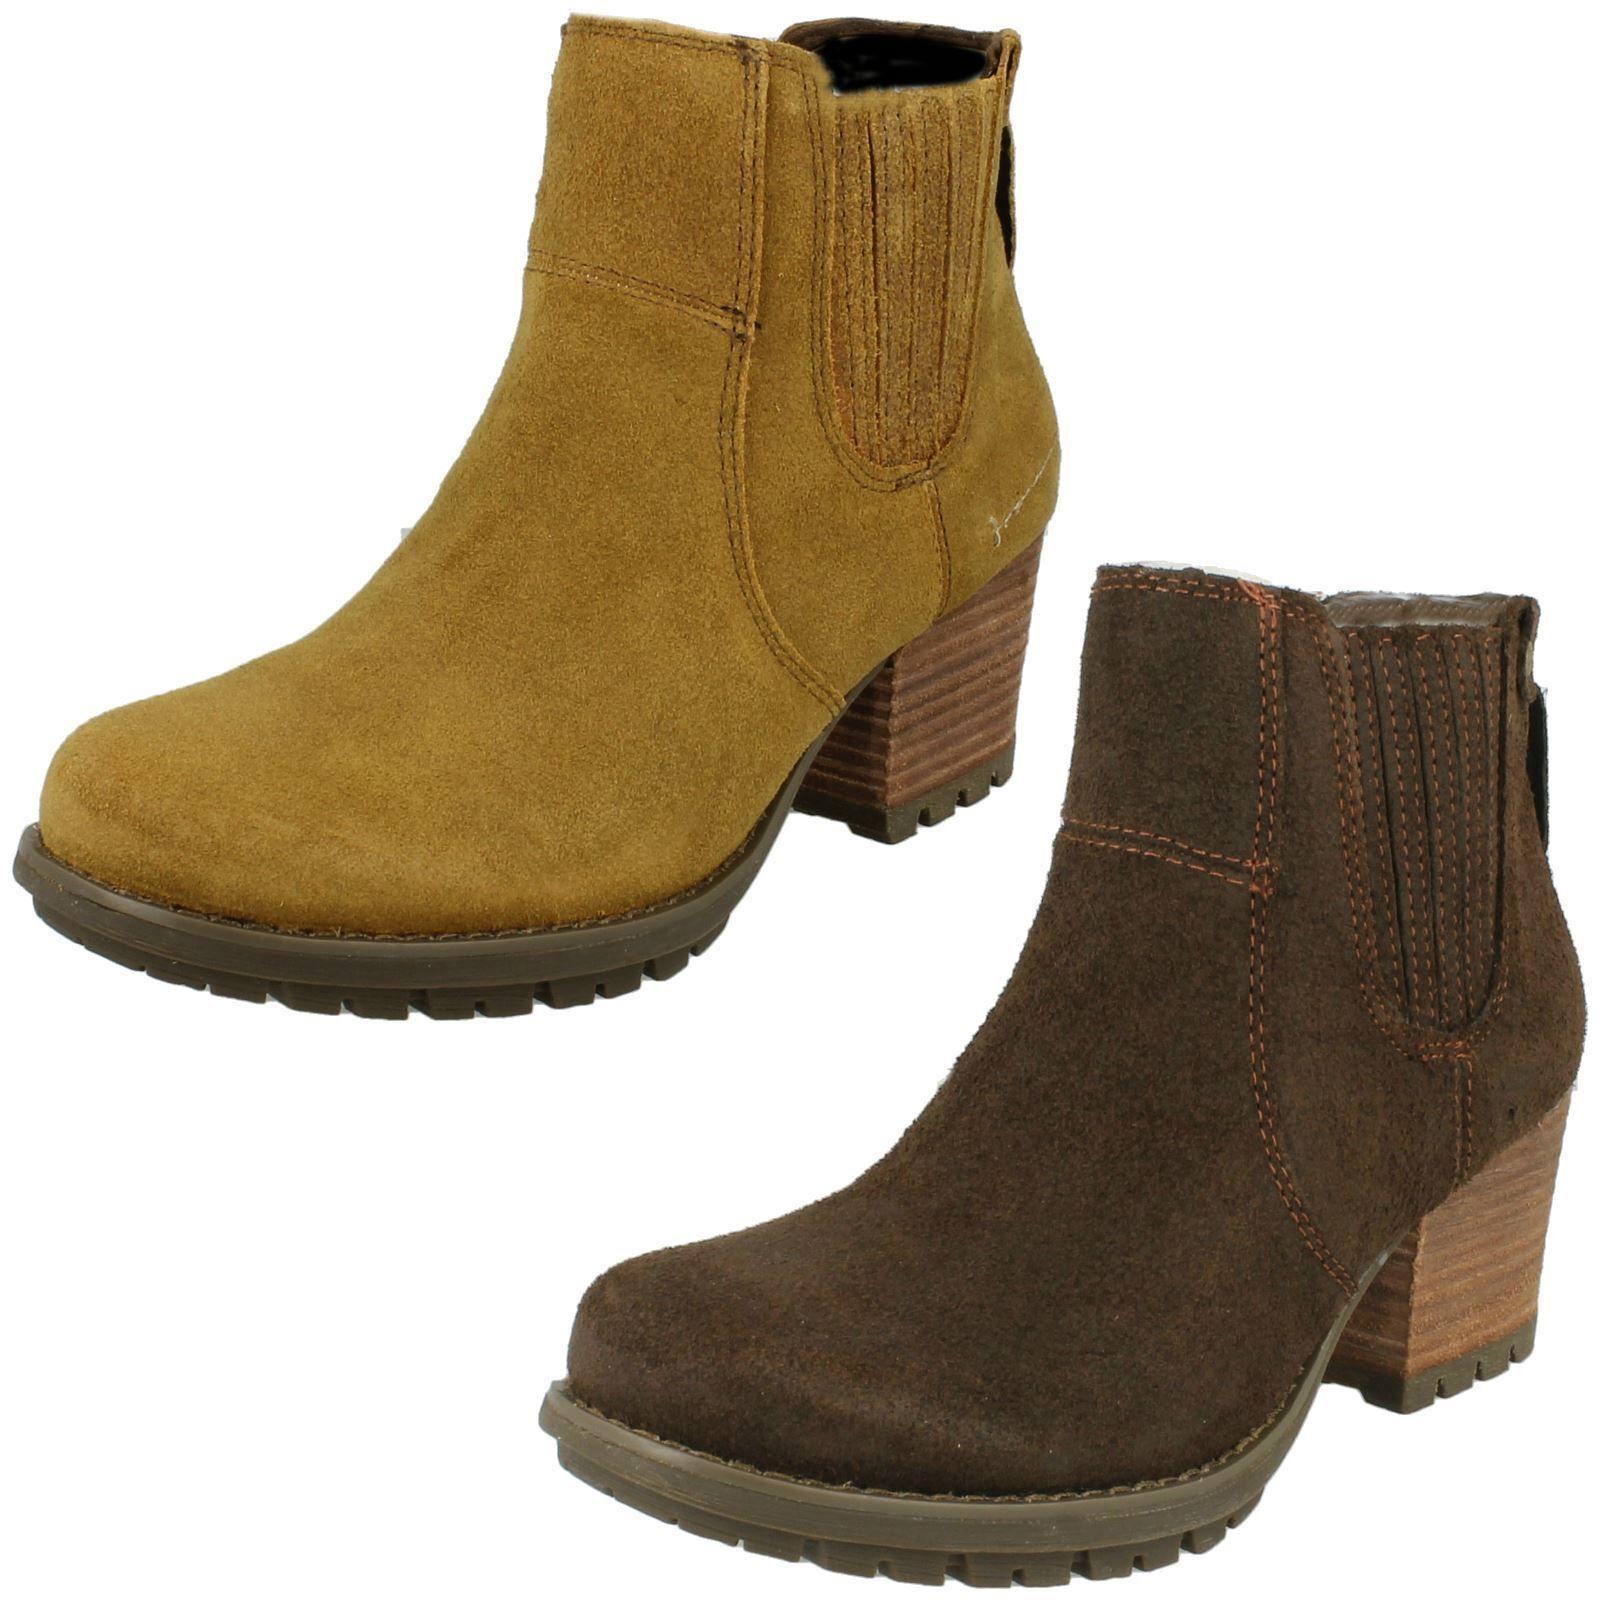 Ladies Caterpillar Allison Mocha Or Dark Beige Suede Pull On Ankle Boots